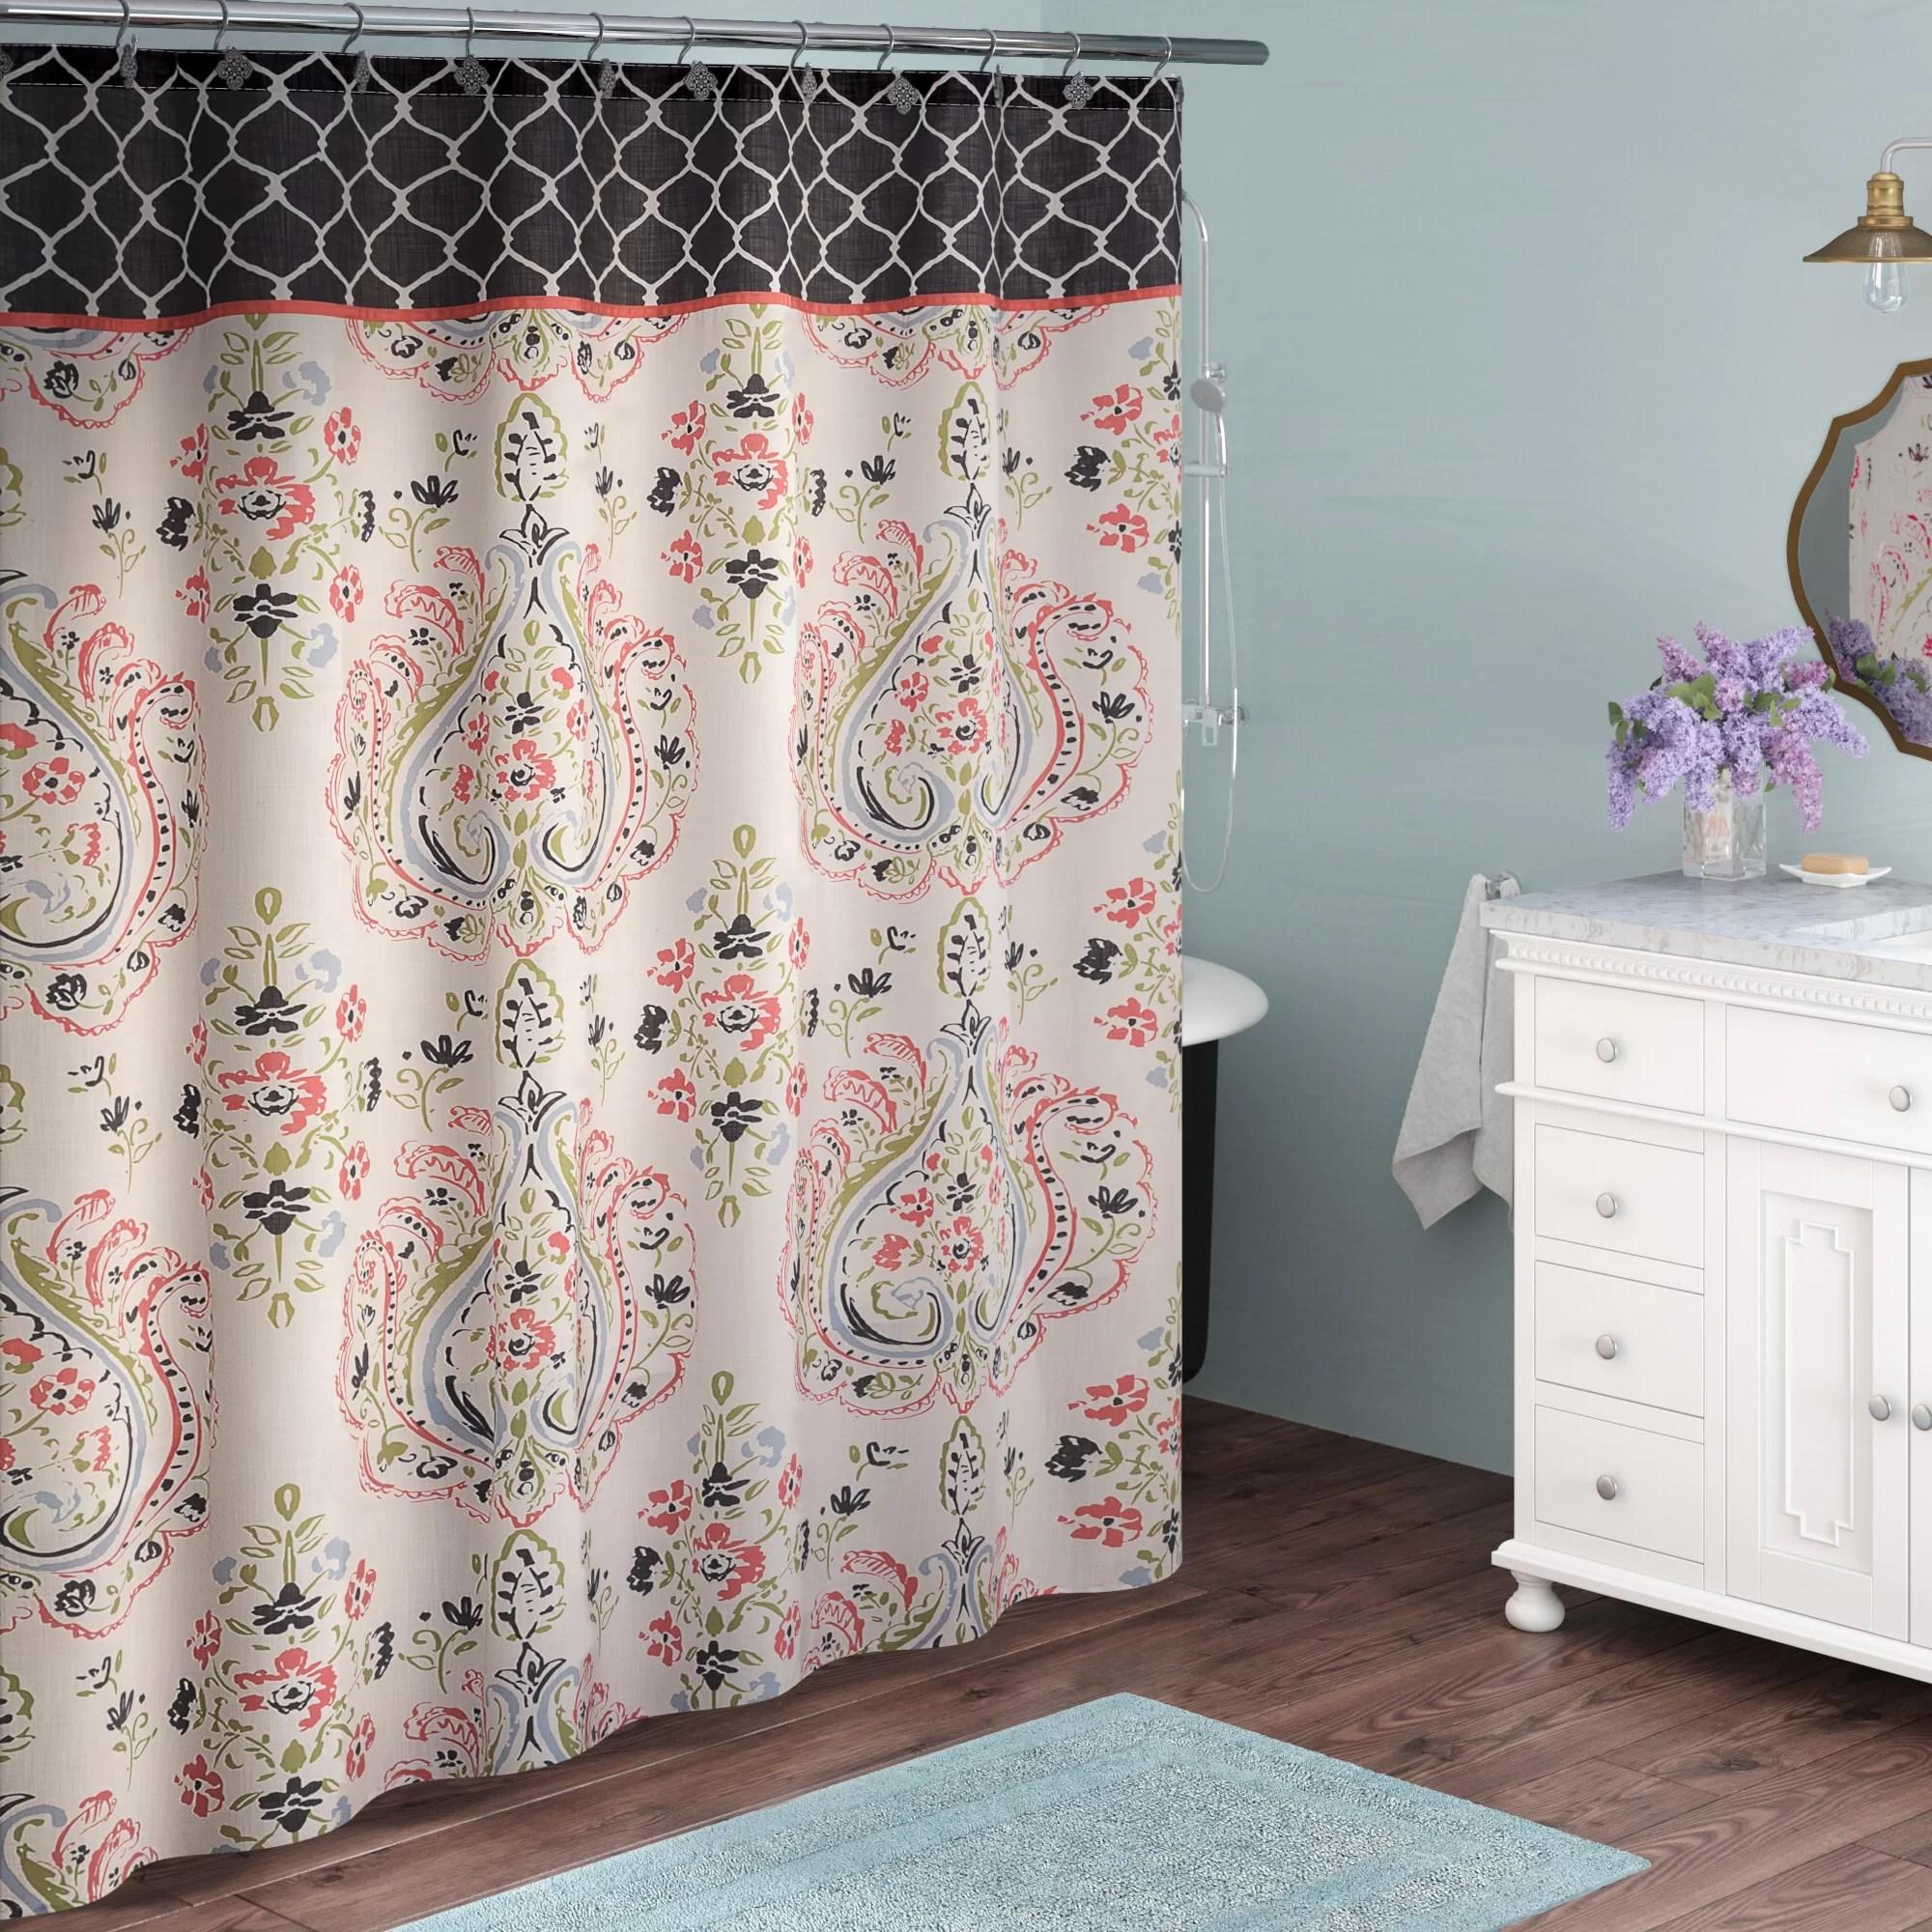 quinnes single shower curtain